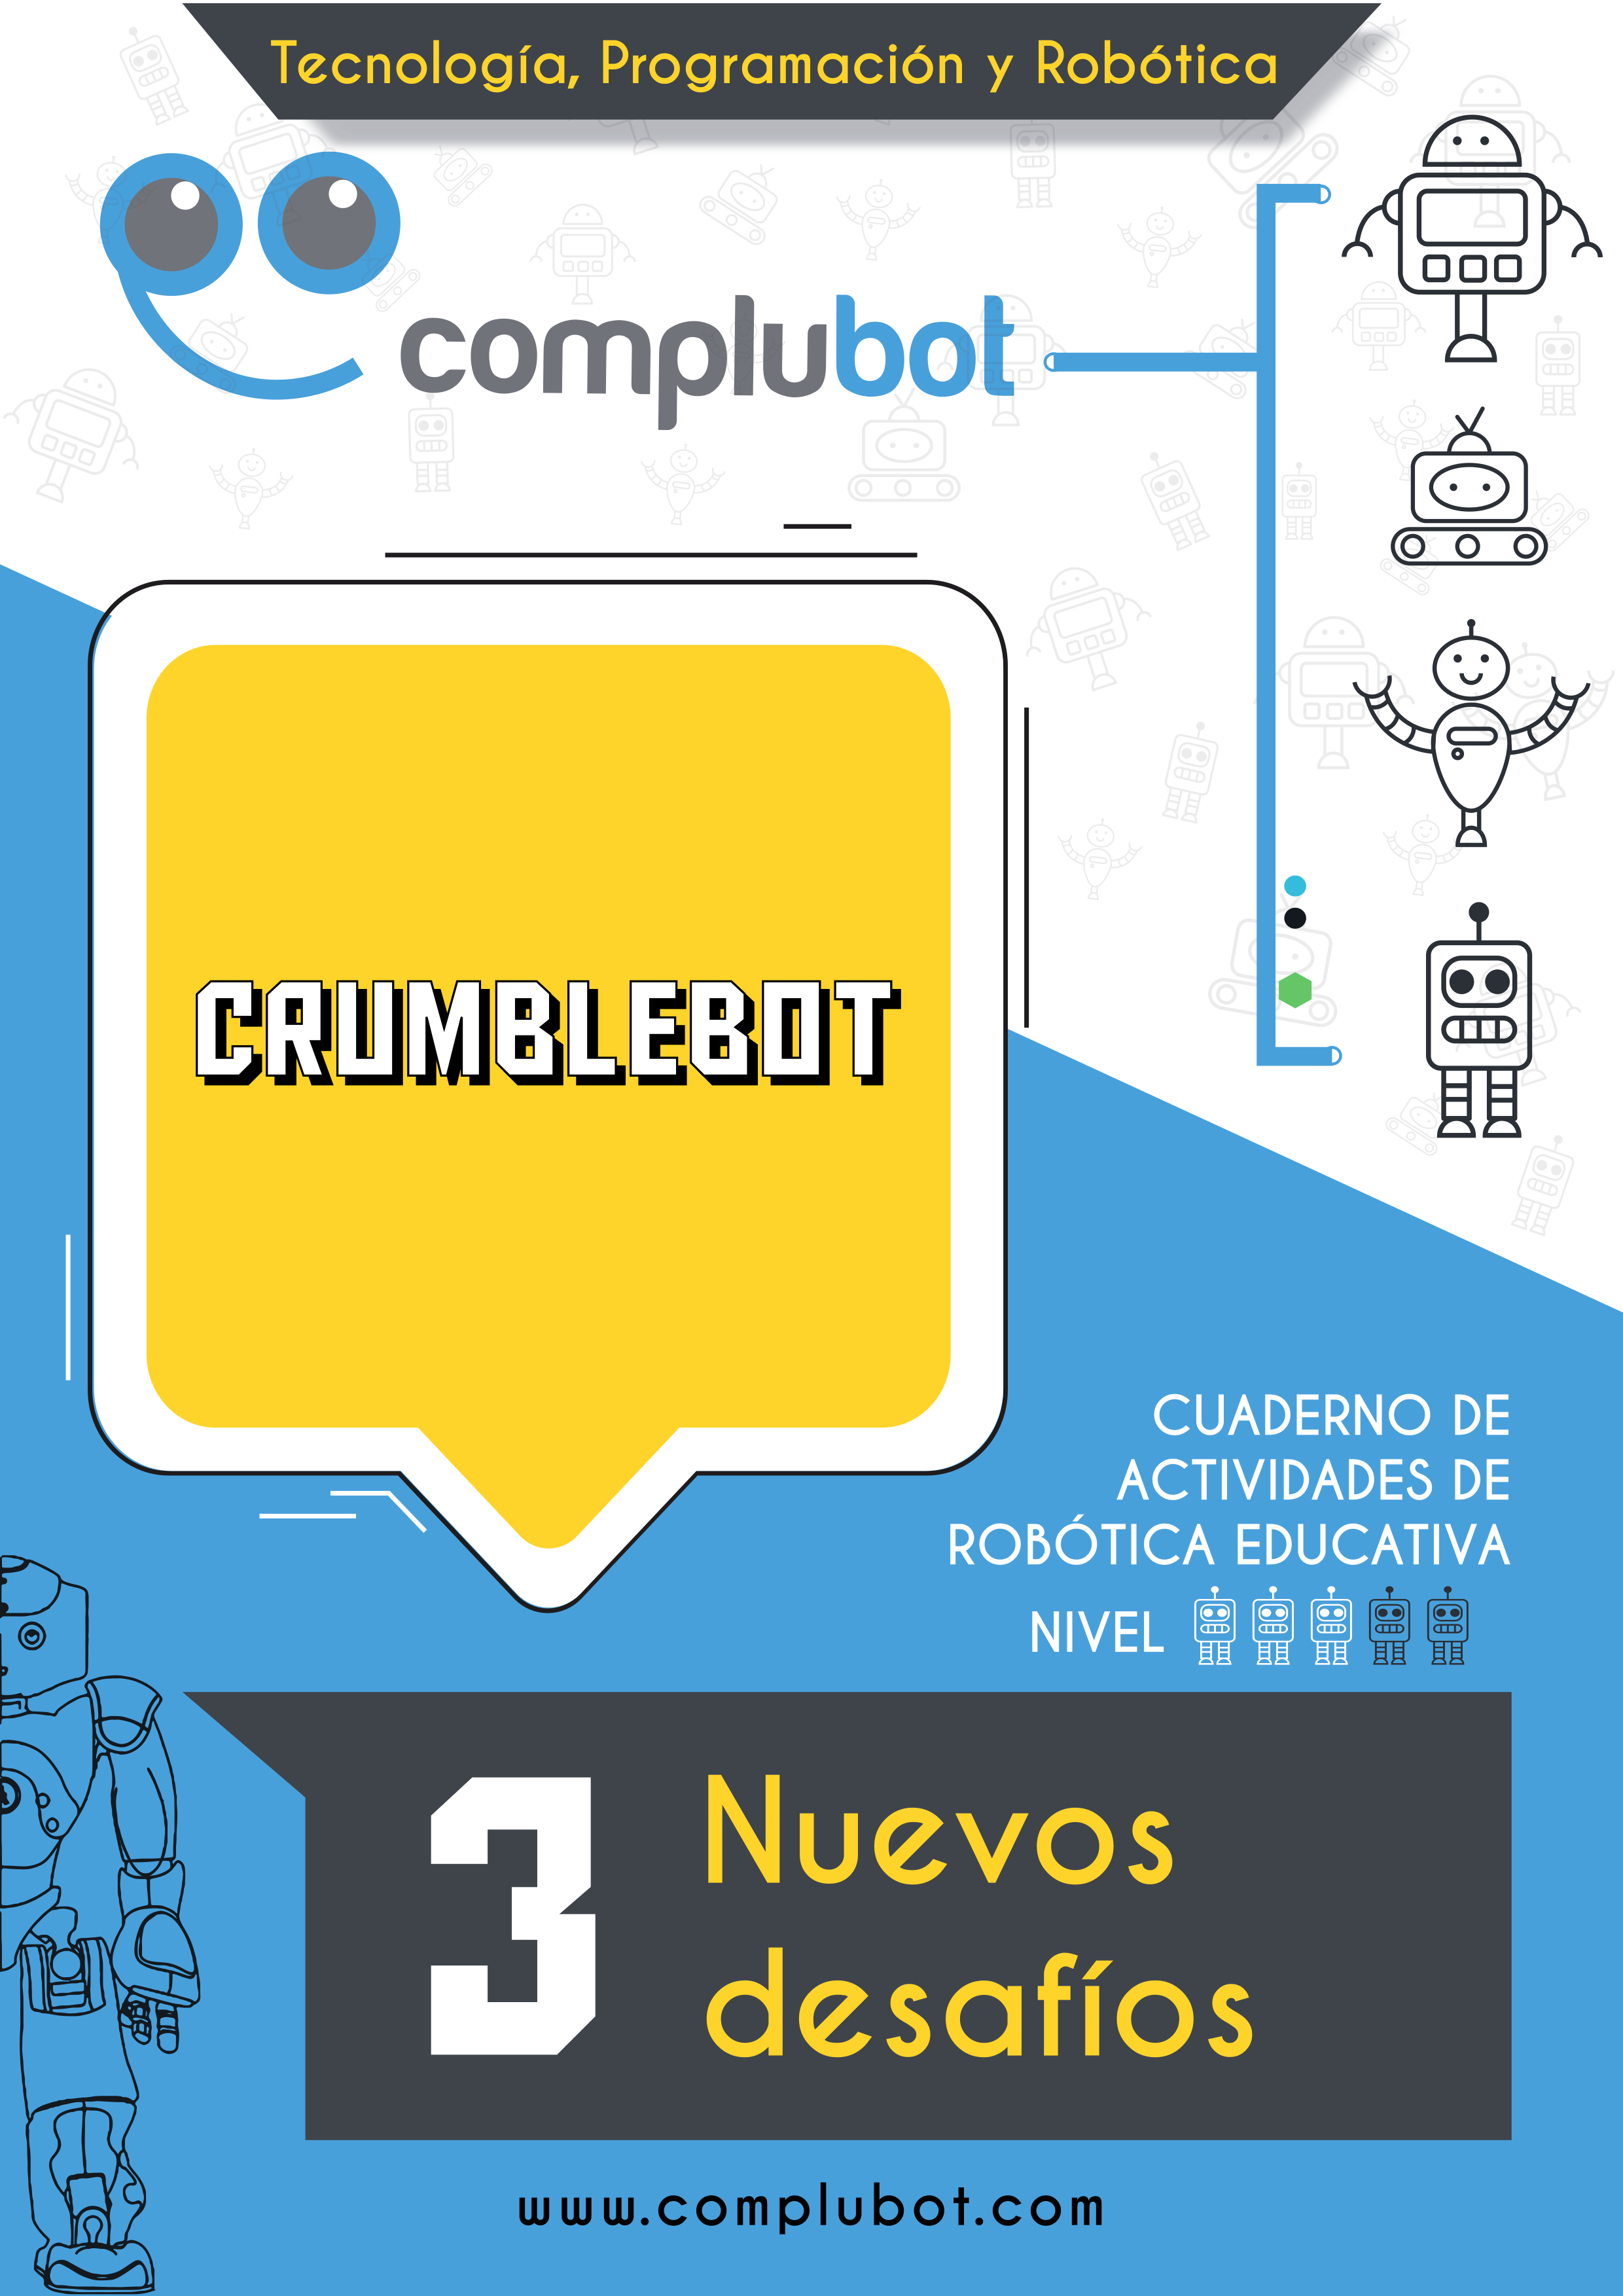 cdare_crumblebot3